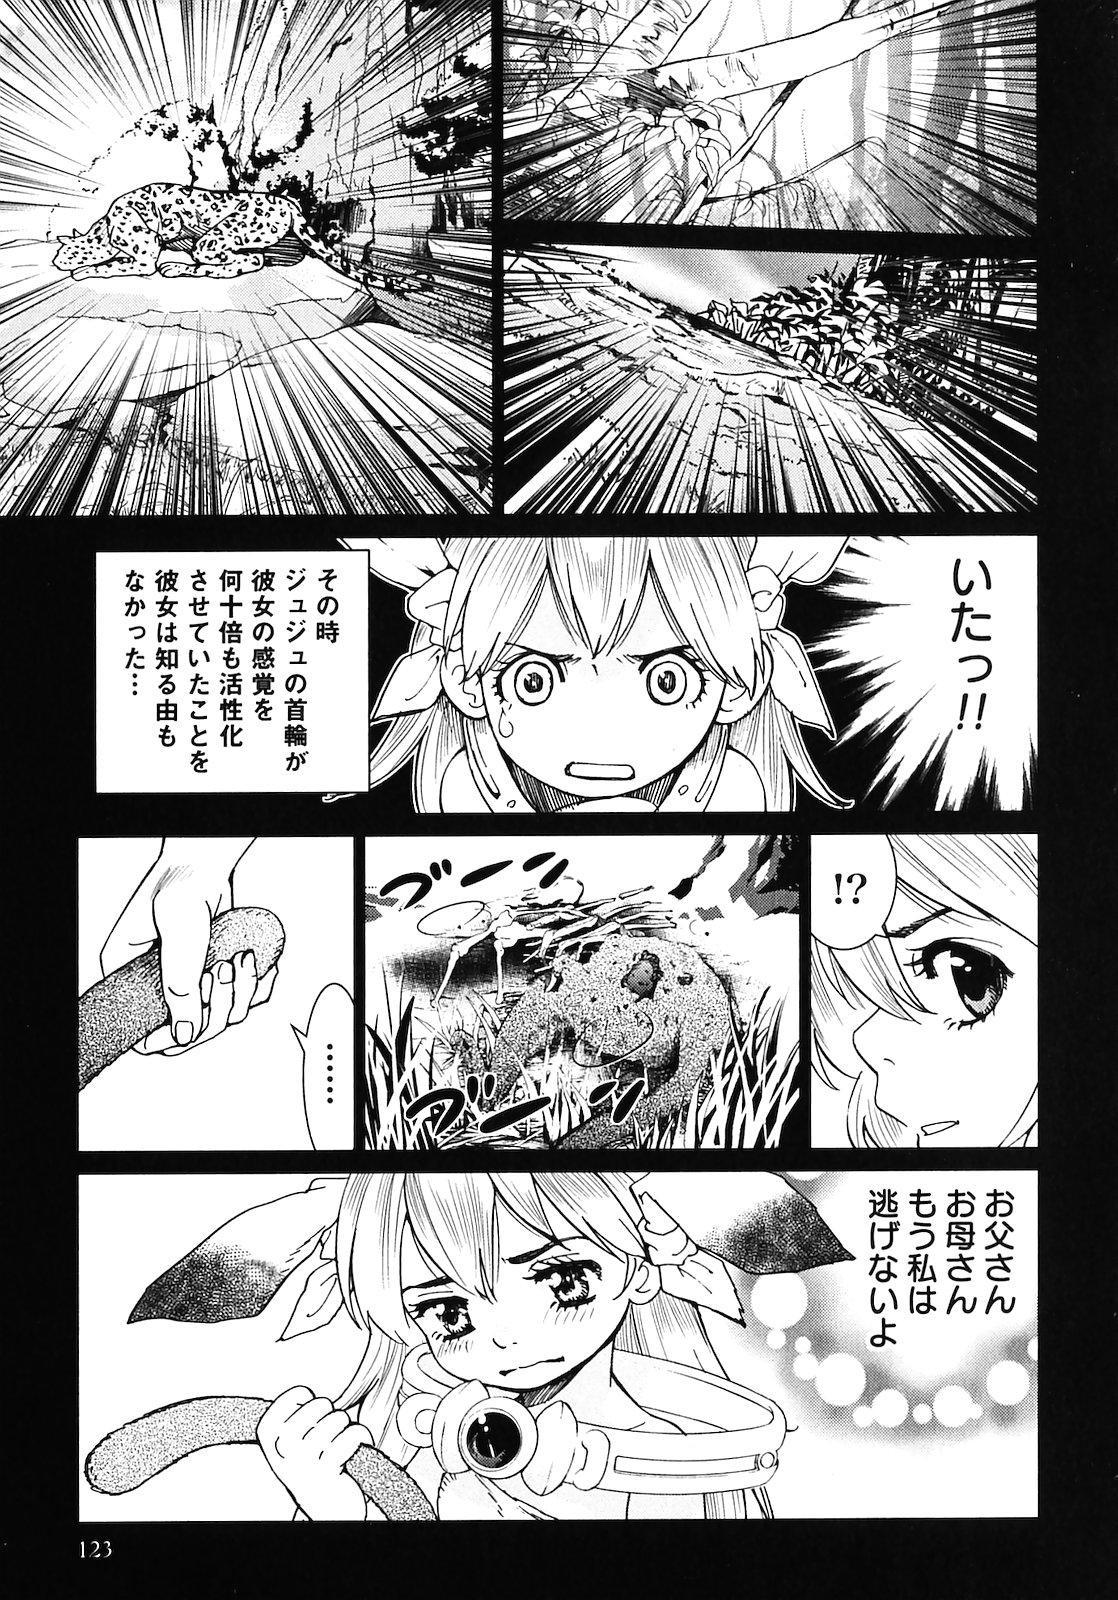 Makyo no Shanana Vol.02 124